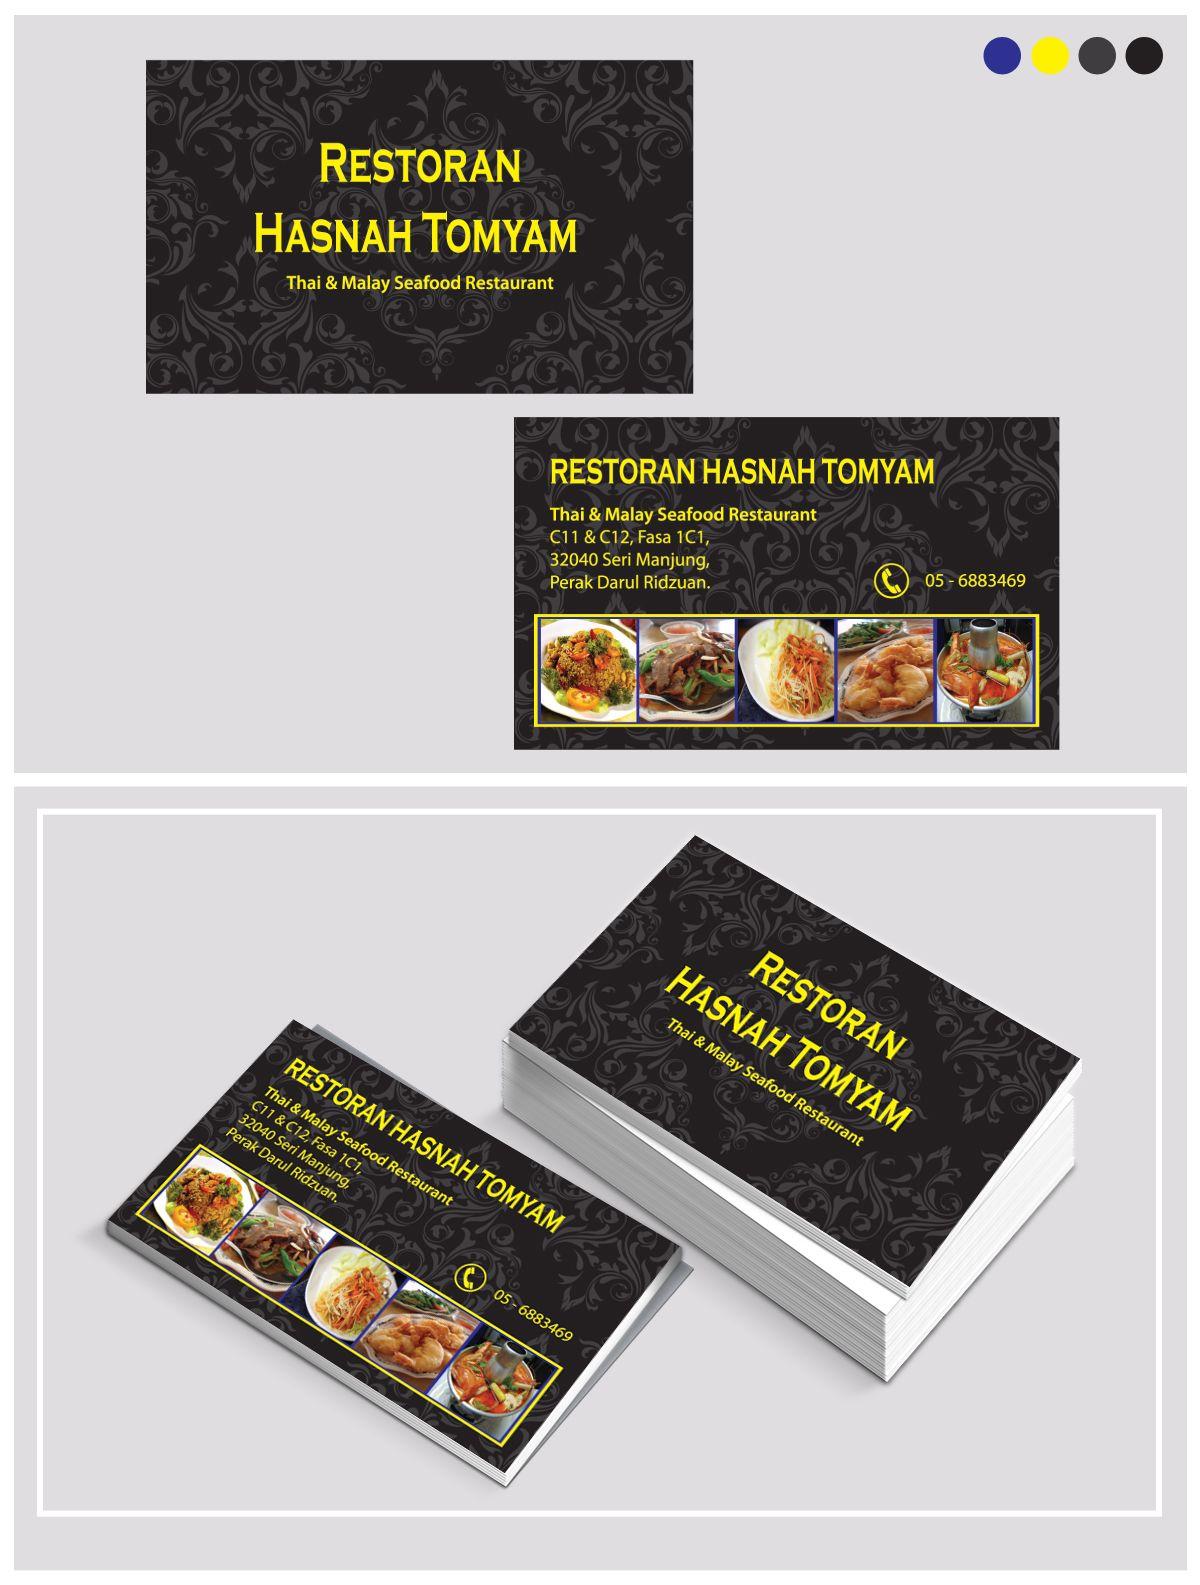 Business Card Thai Malay Seafood Restaurant Restoran Hasnah